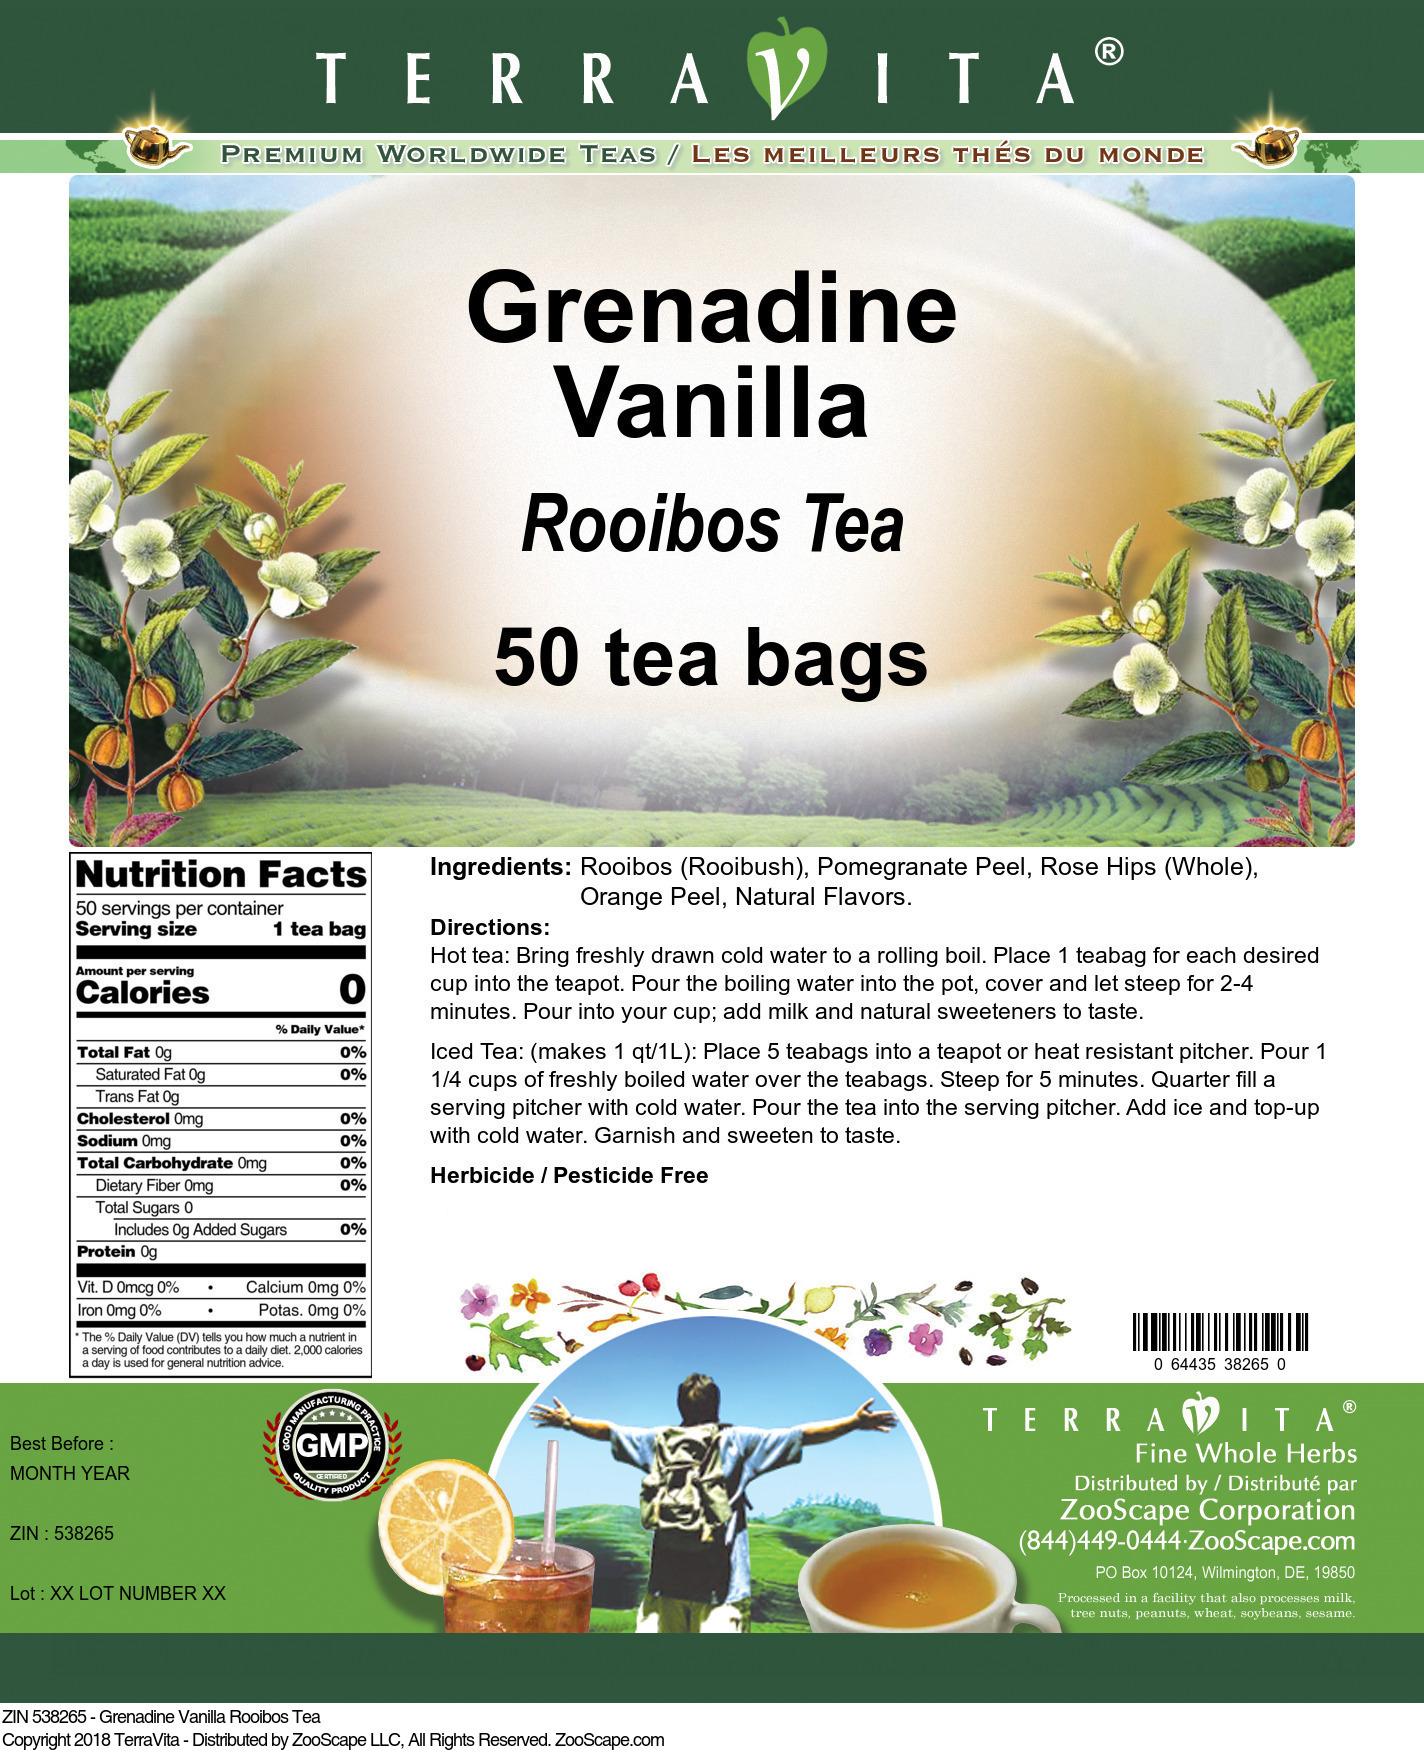 Grenadine Vanilla Rooibos Tea